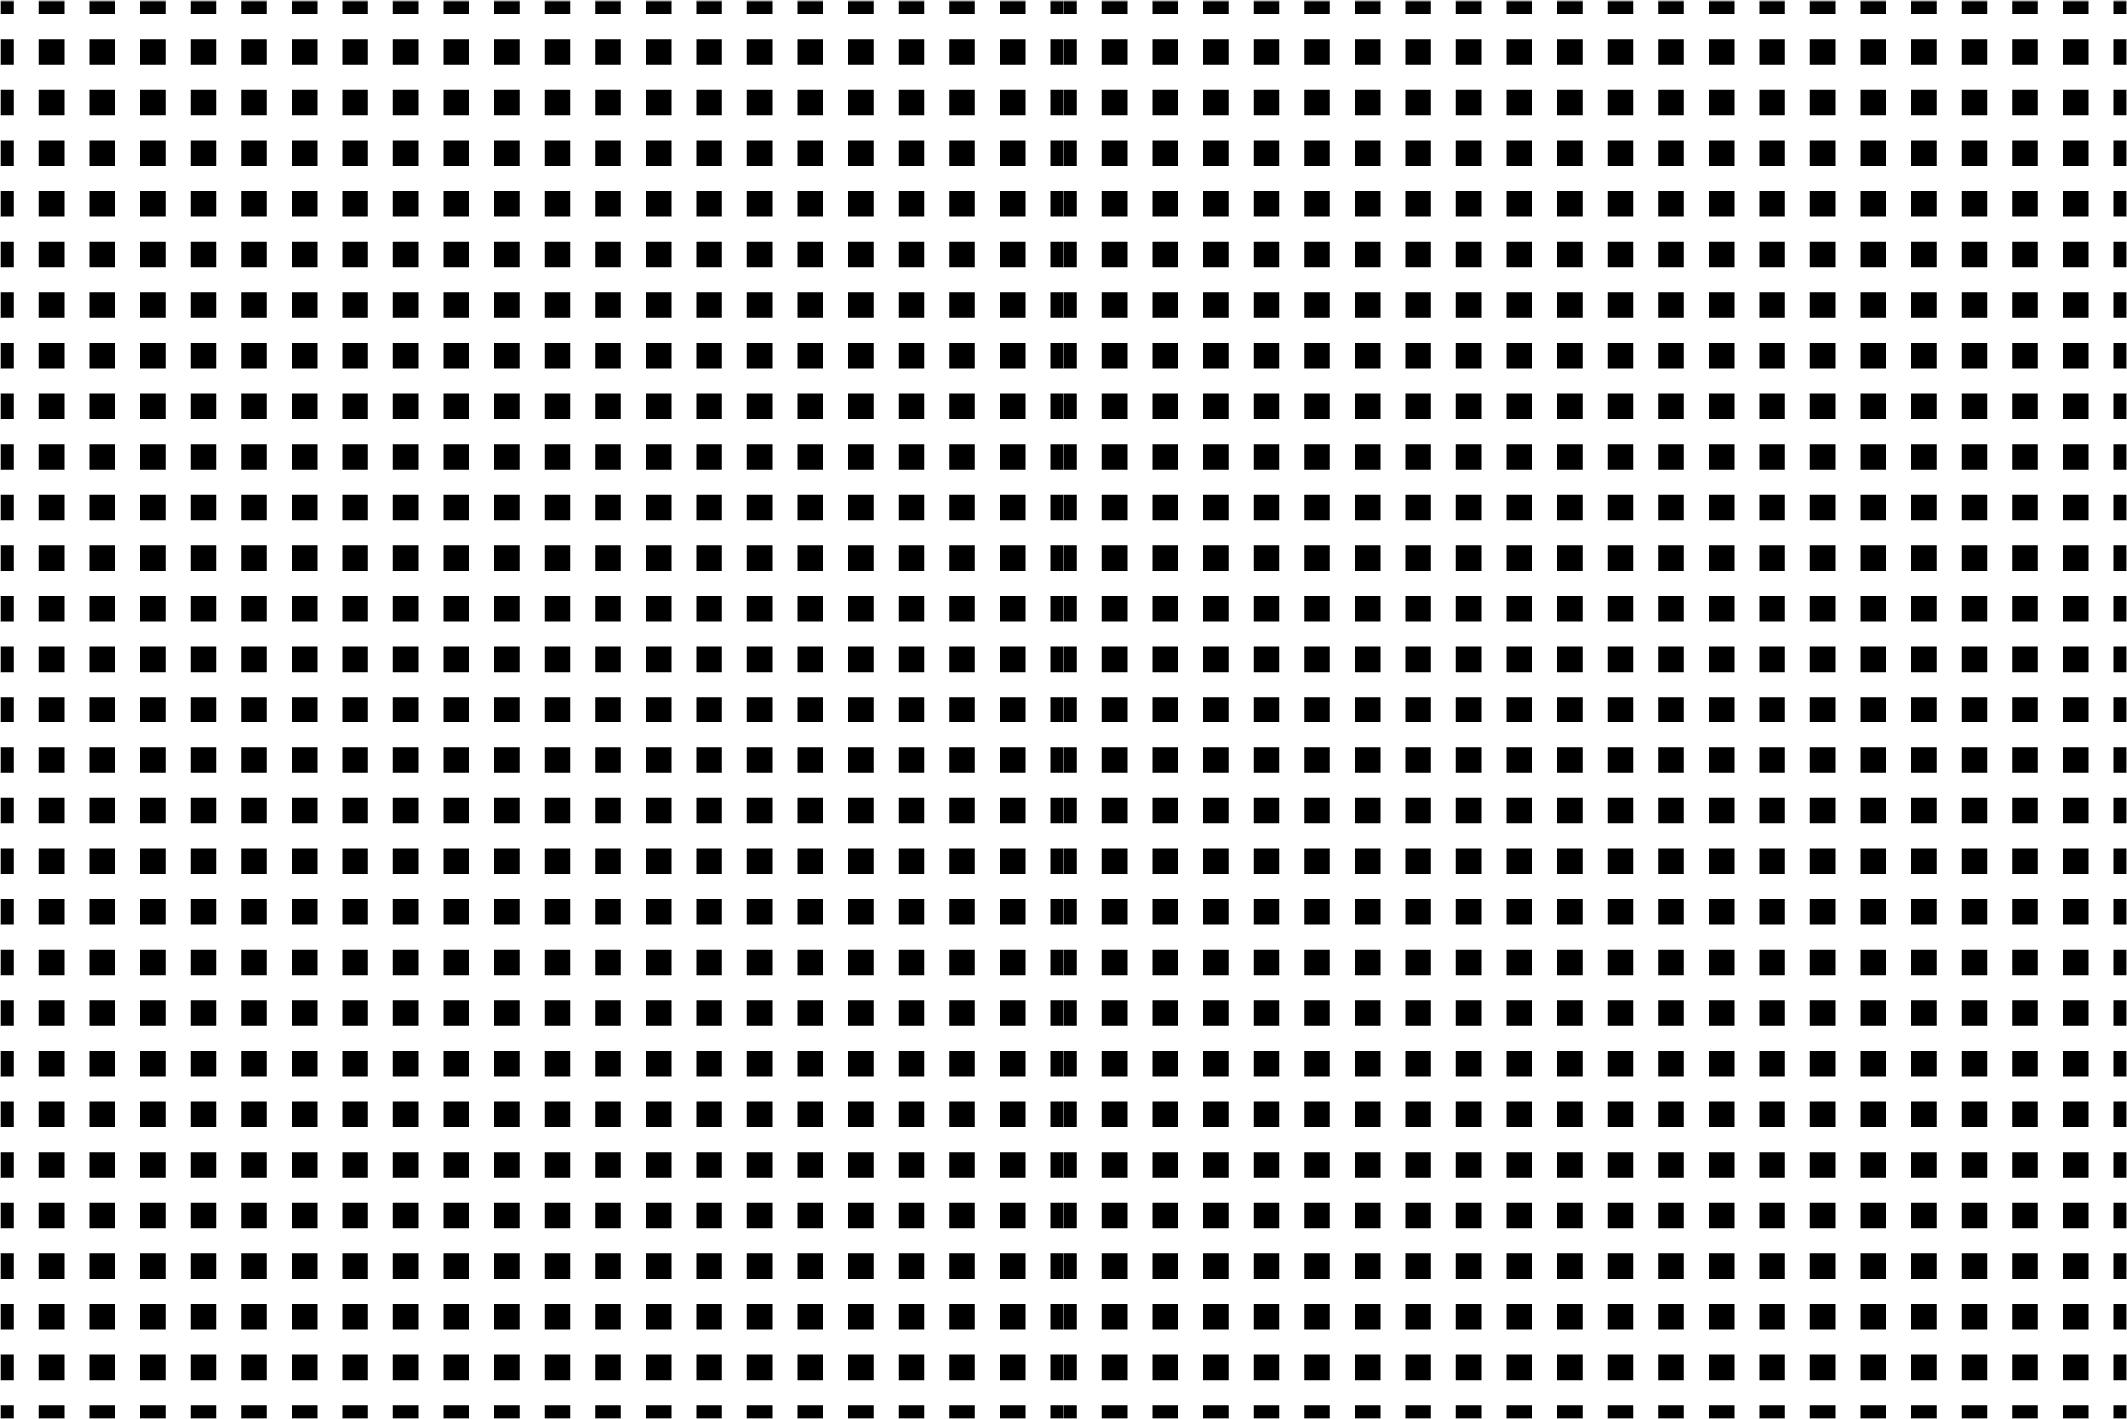 Seamless geometric patterns. B&W. example image 4